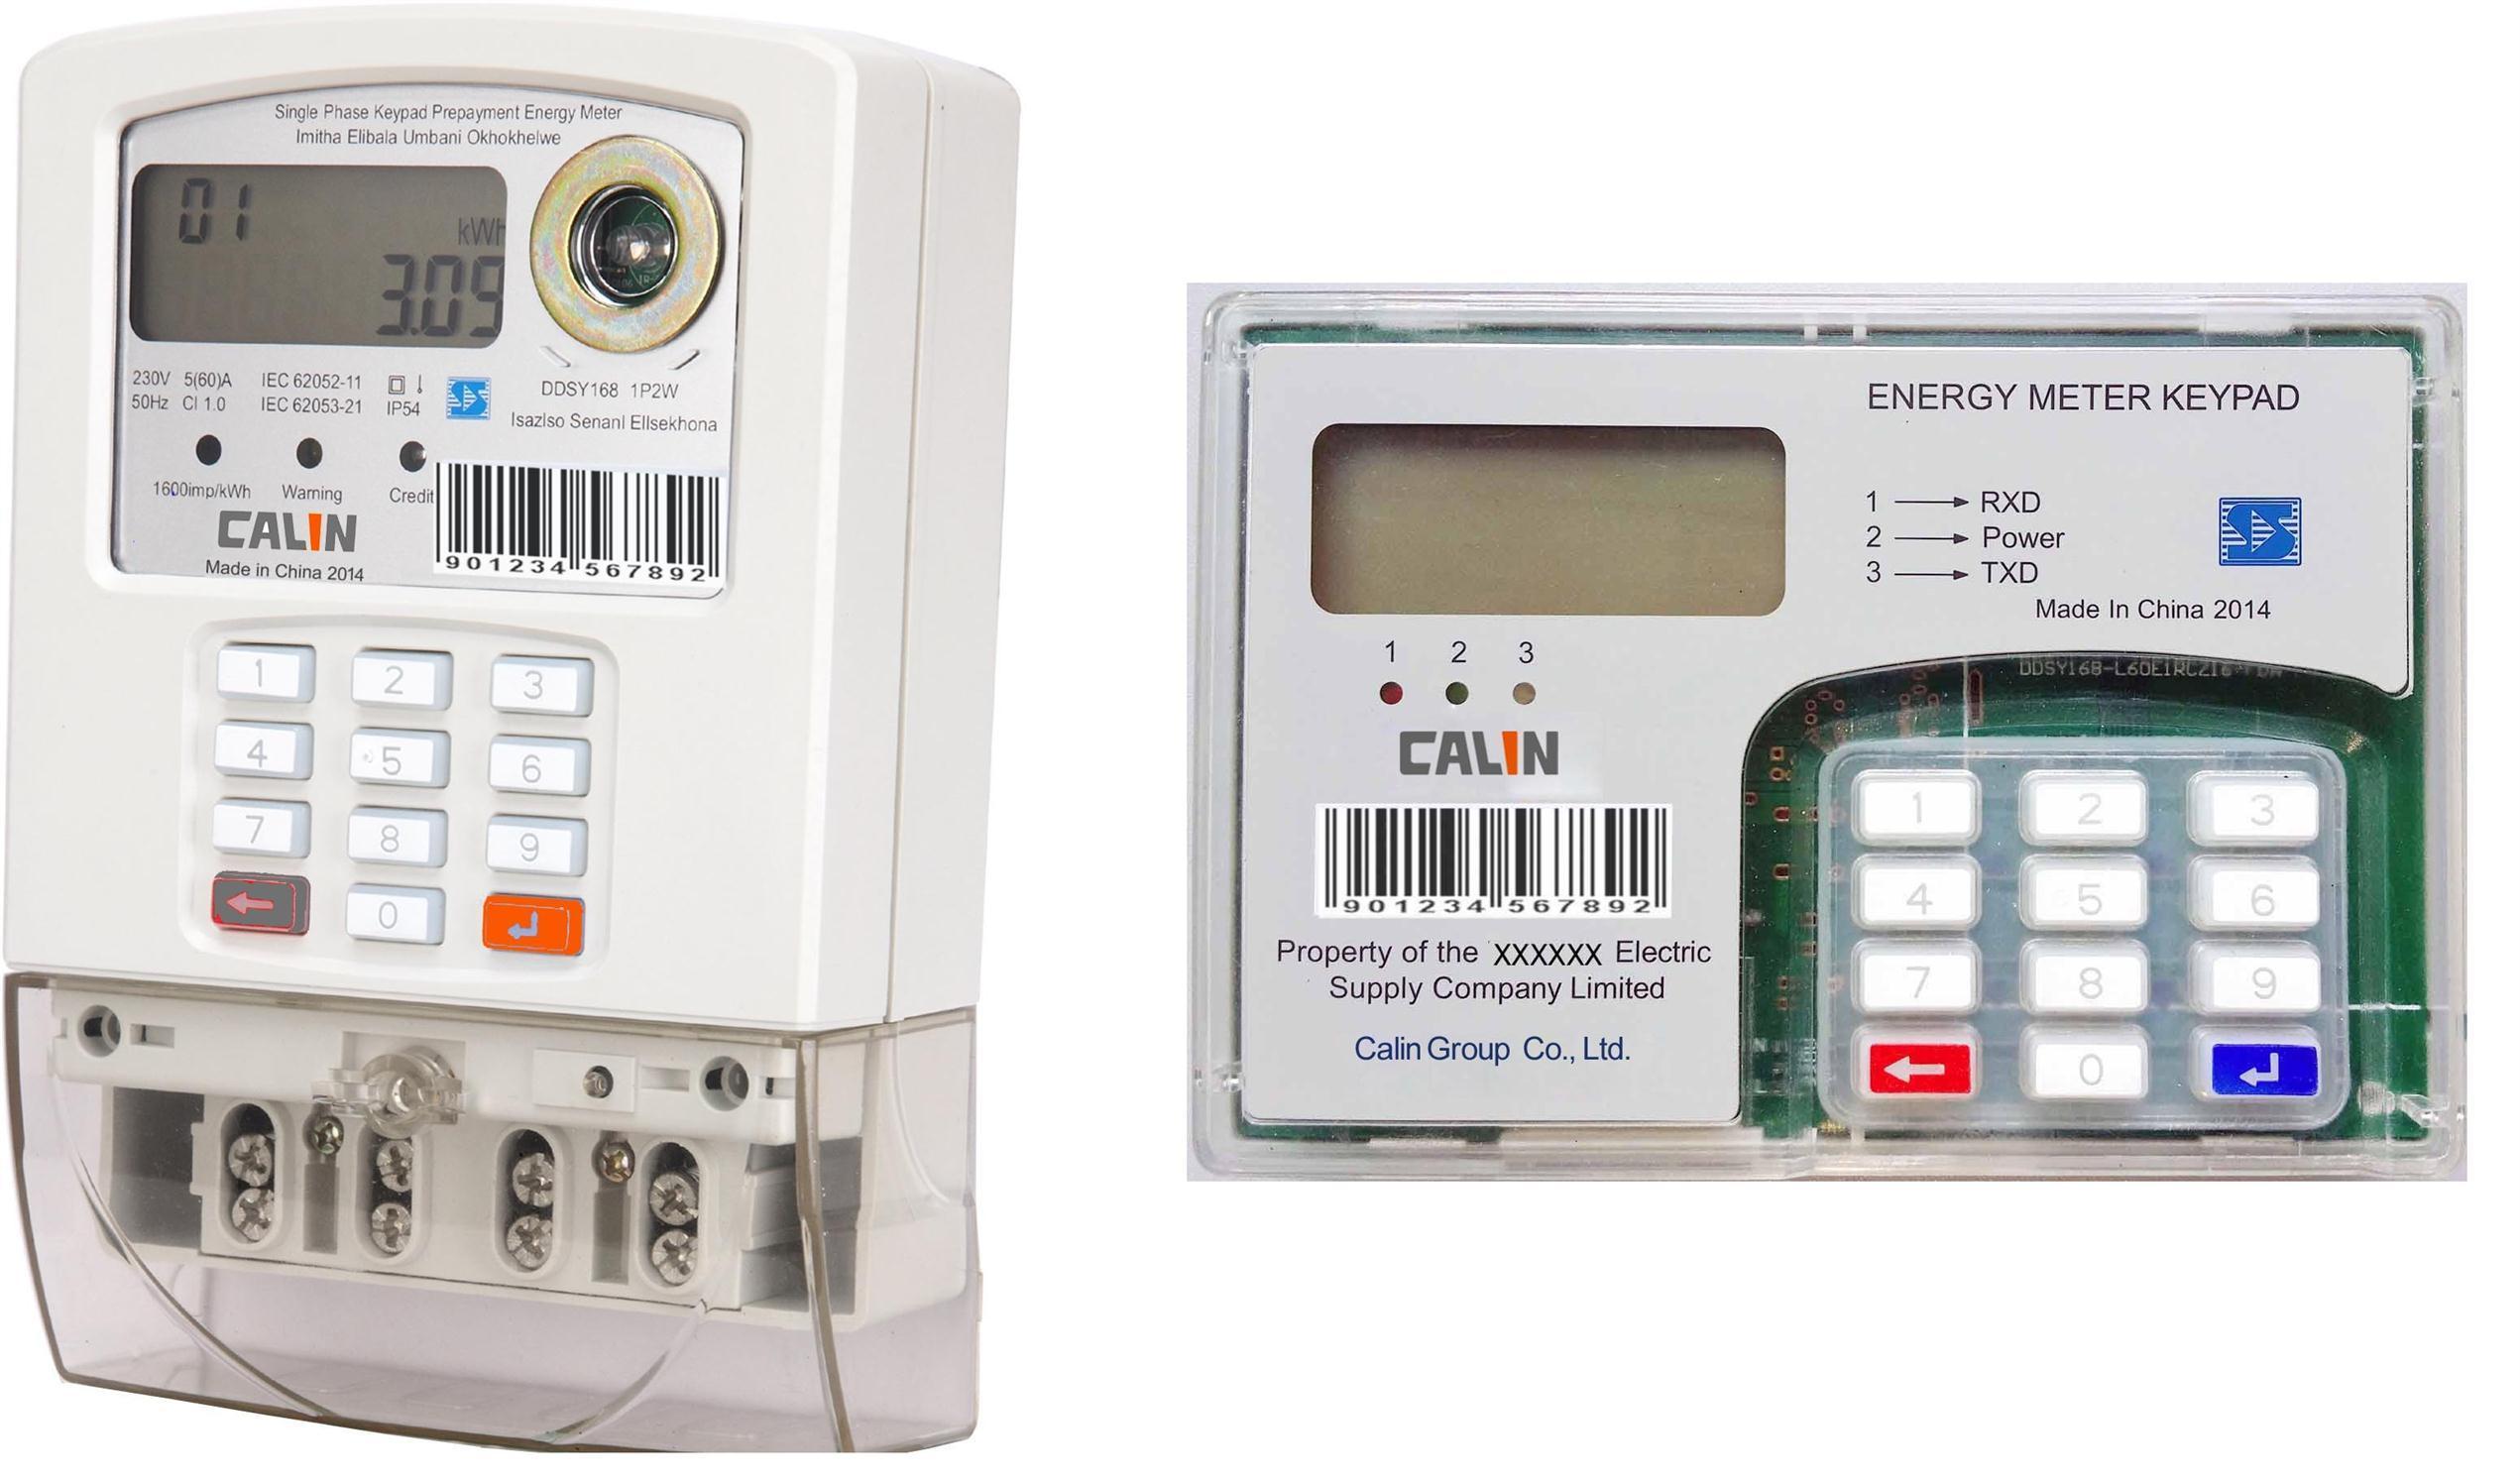 Single Phase Sts Split Keypad Prepaid/Prepayment Energy Meter